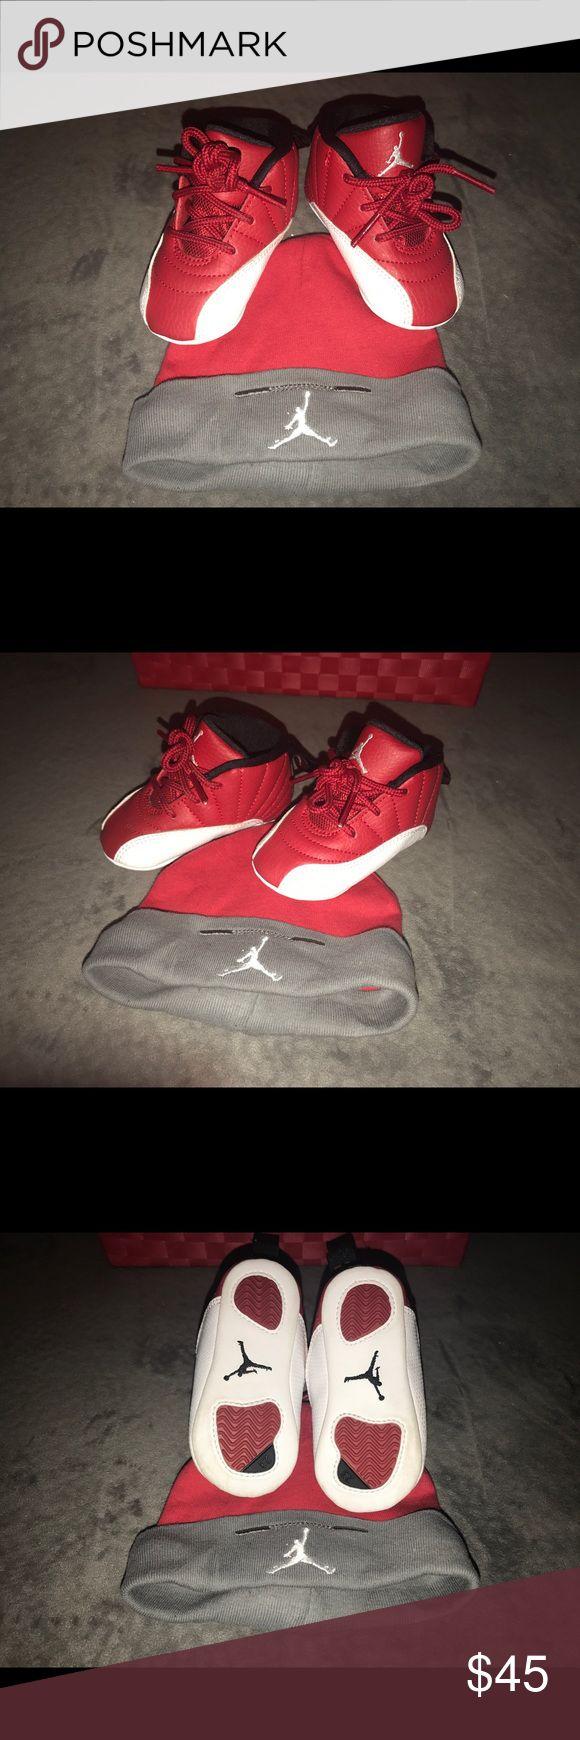 Baby Jordan shoes Size 3c Jordan Shoes Sneakers